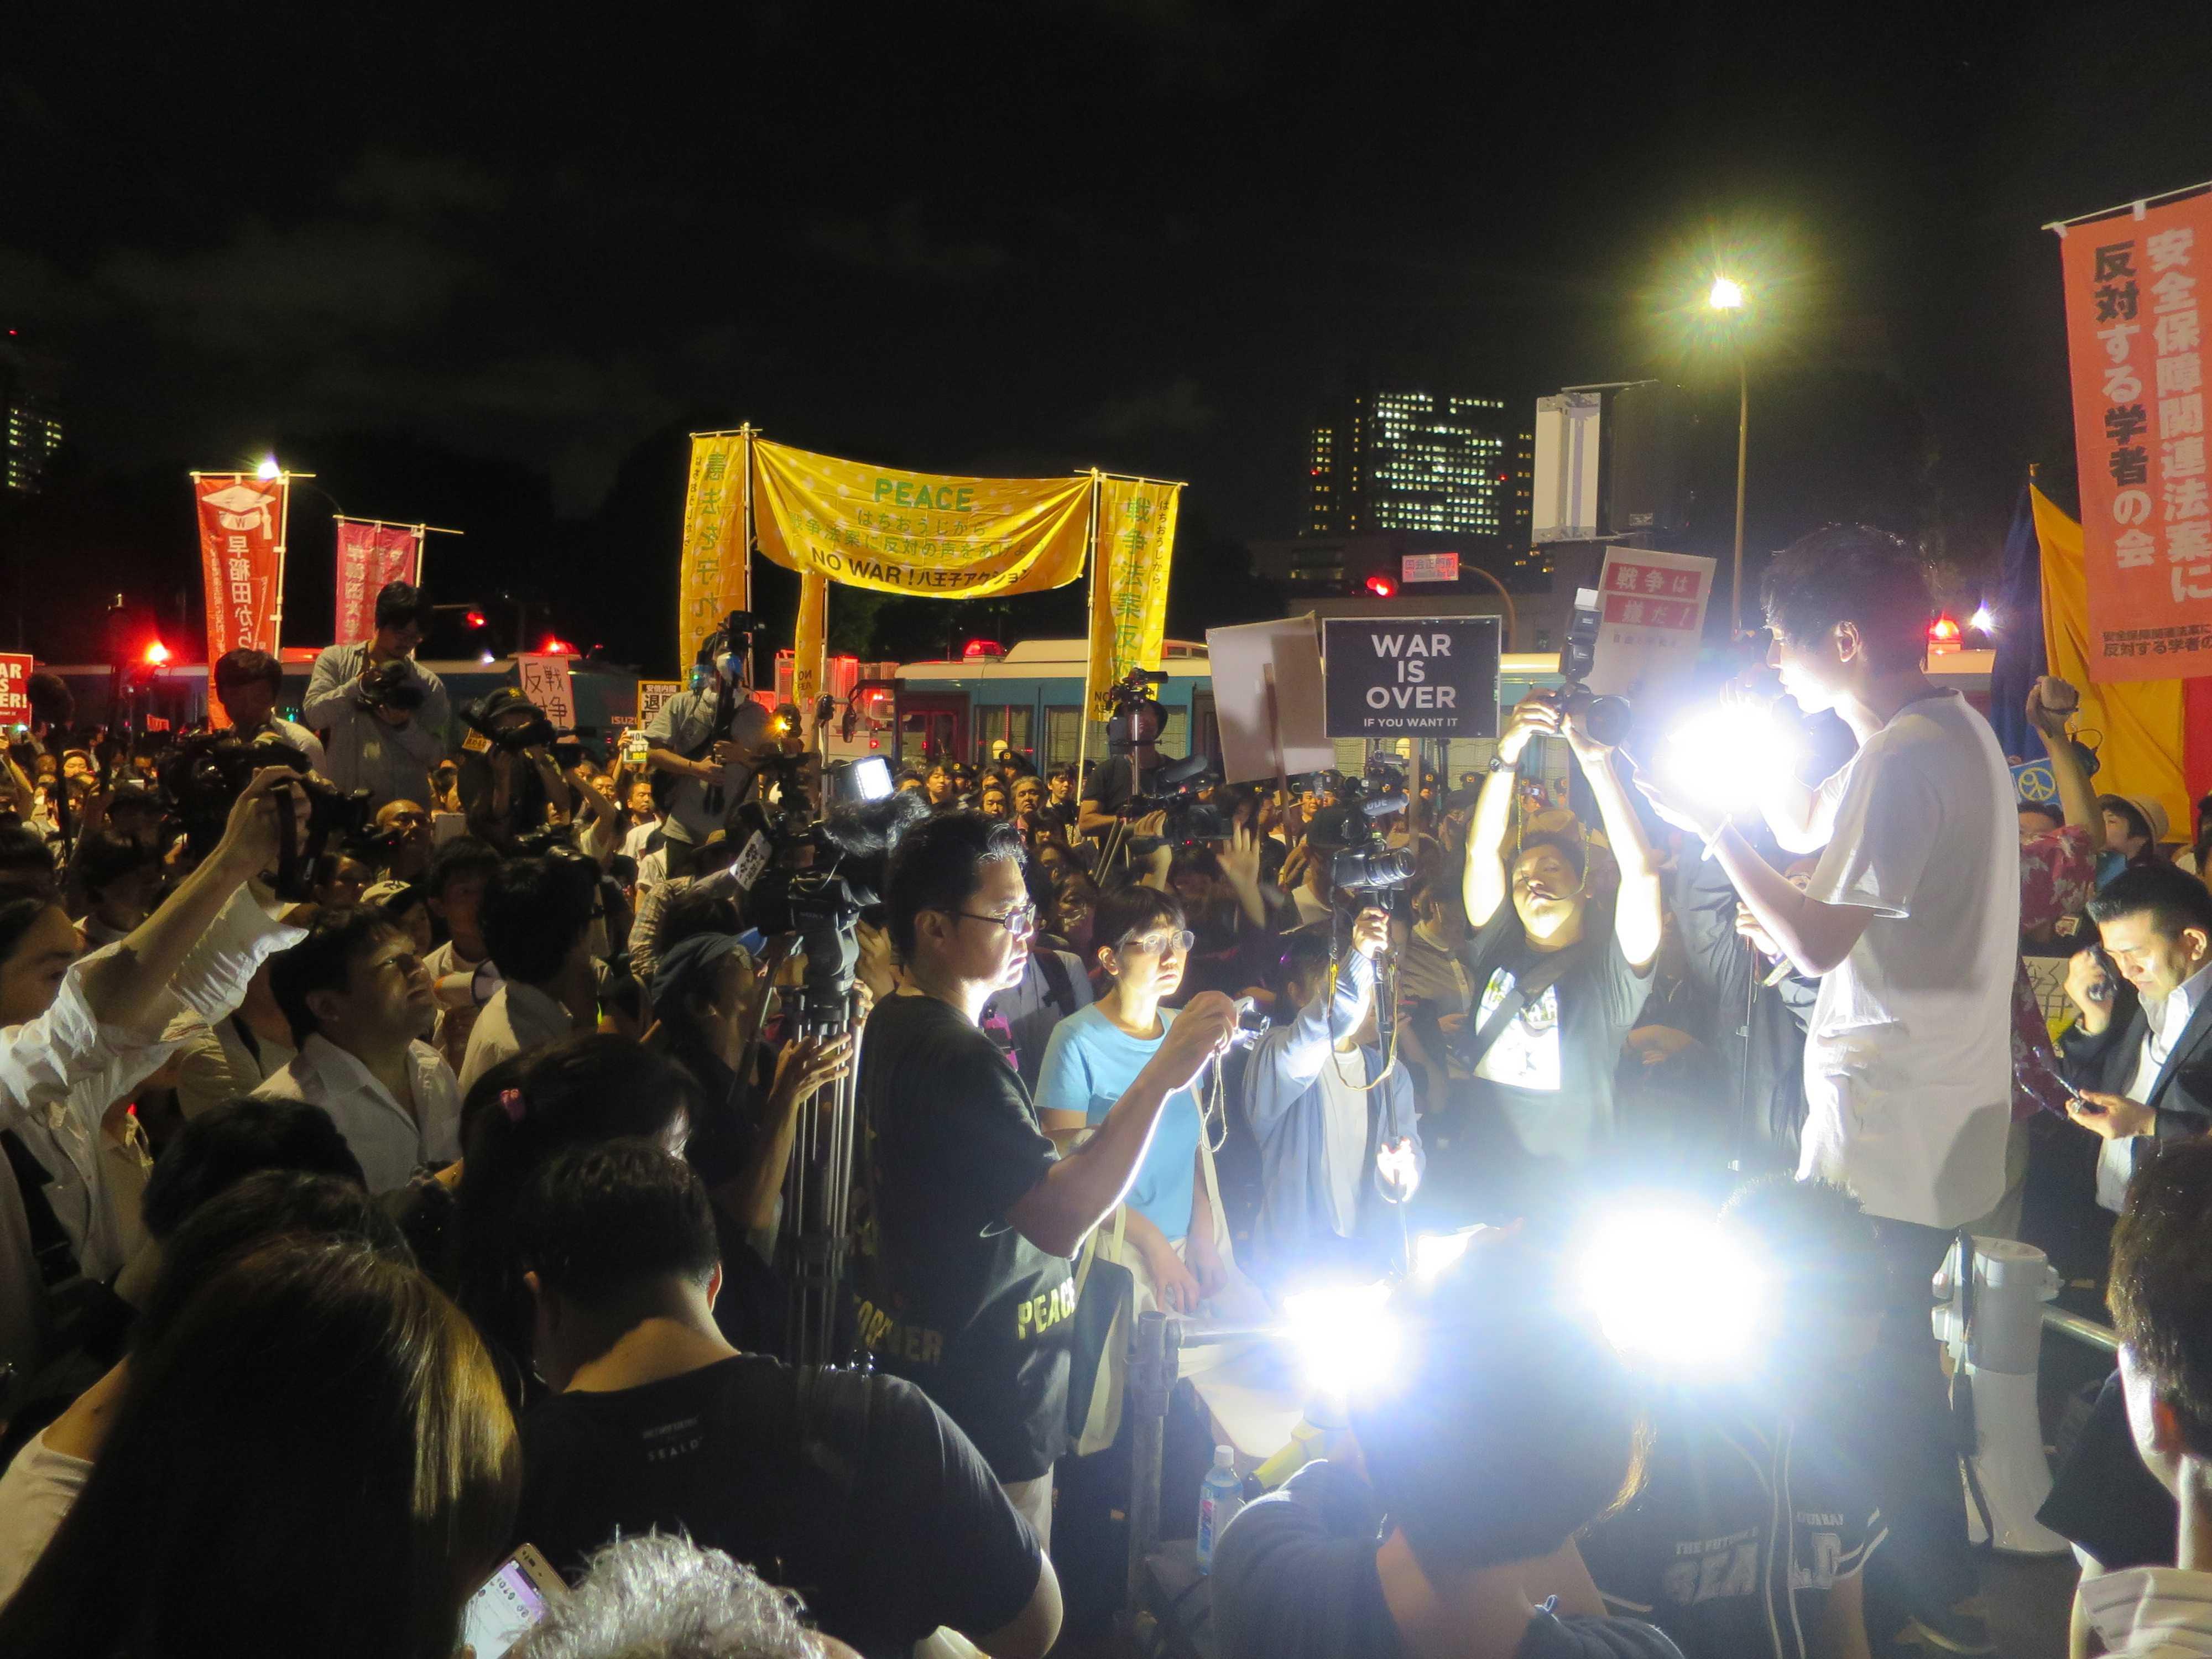 SEALDs(シールズ)… 国会前デモ、日本の学生や若者が立ち上がった